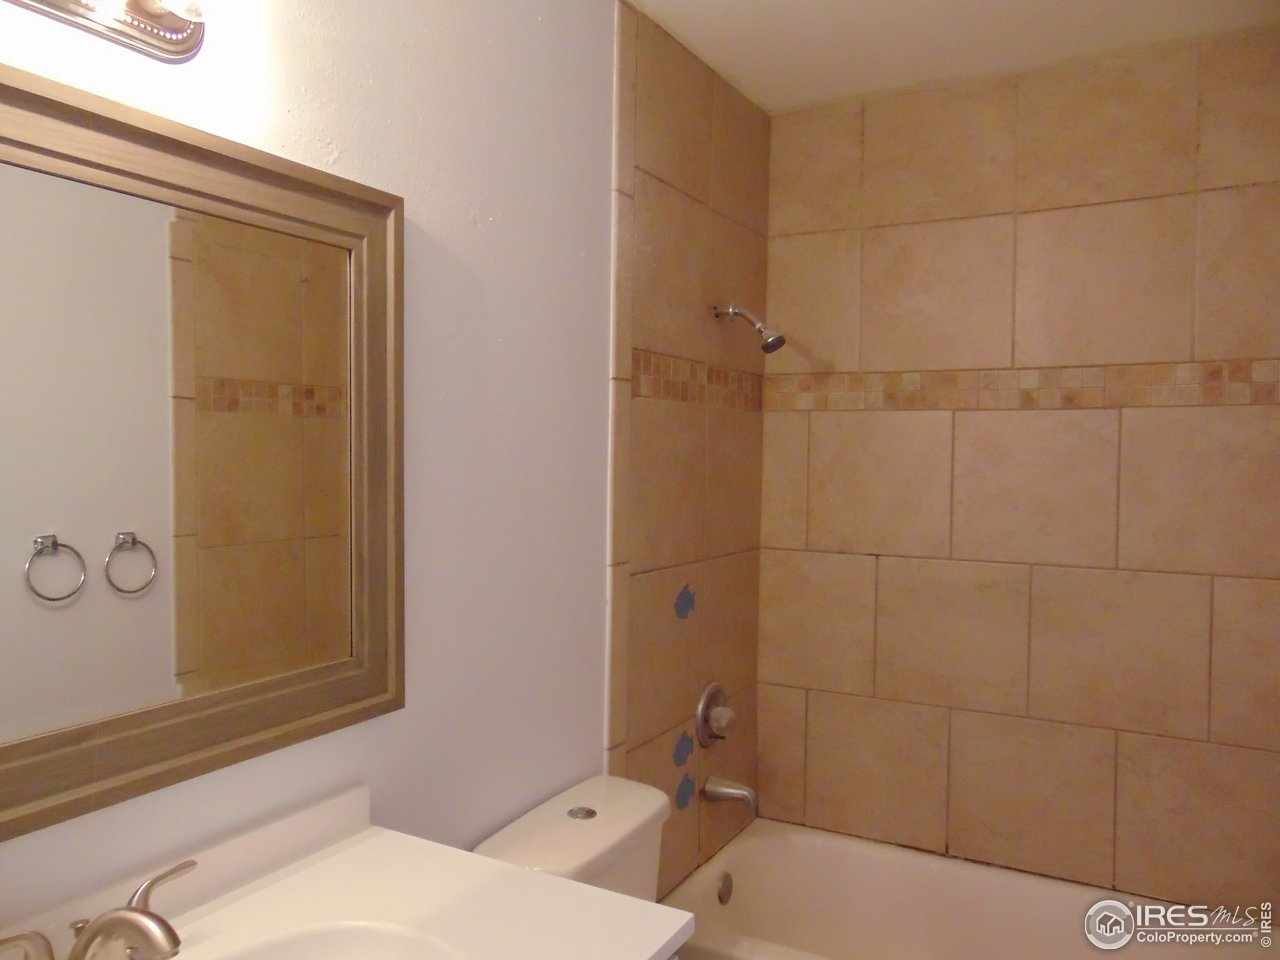 Main bath new vanity, new toilet and fixtures.